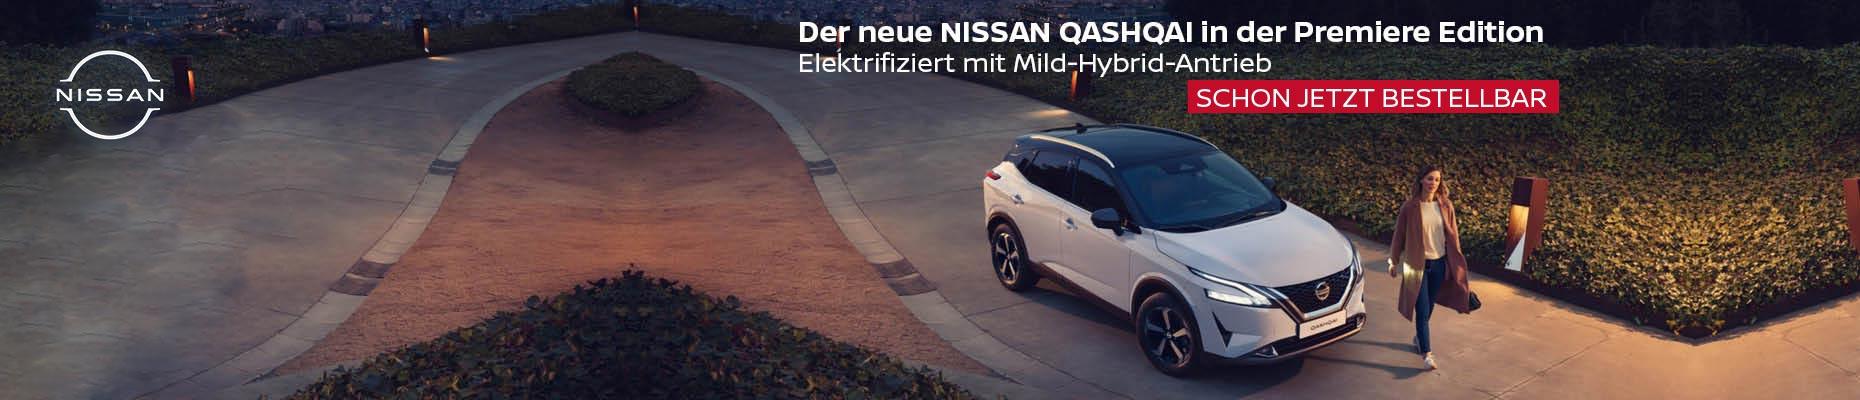 Nissan Qashqai Mildhybrid | Olympic Auto